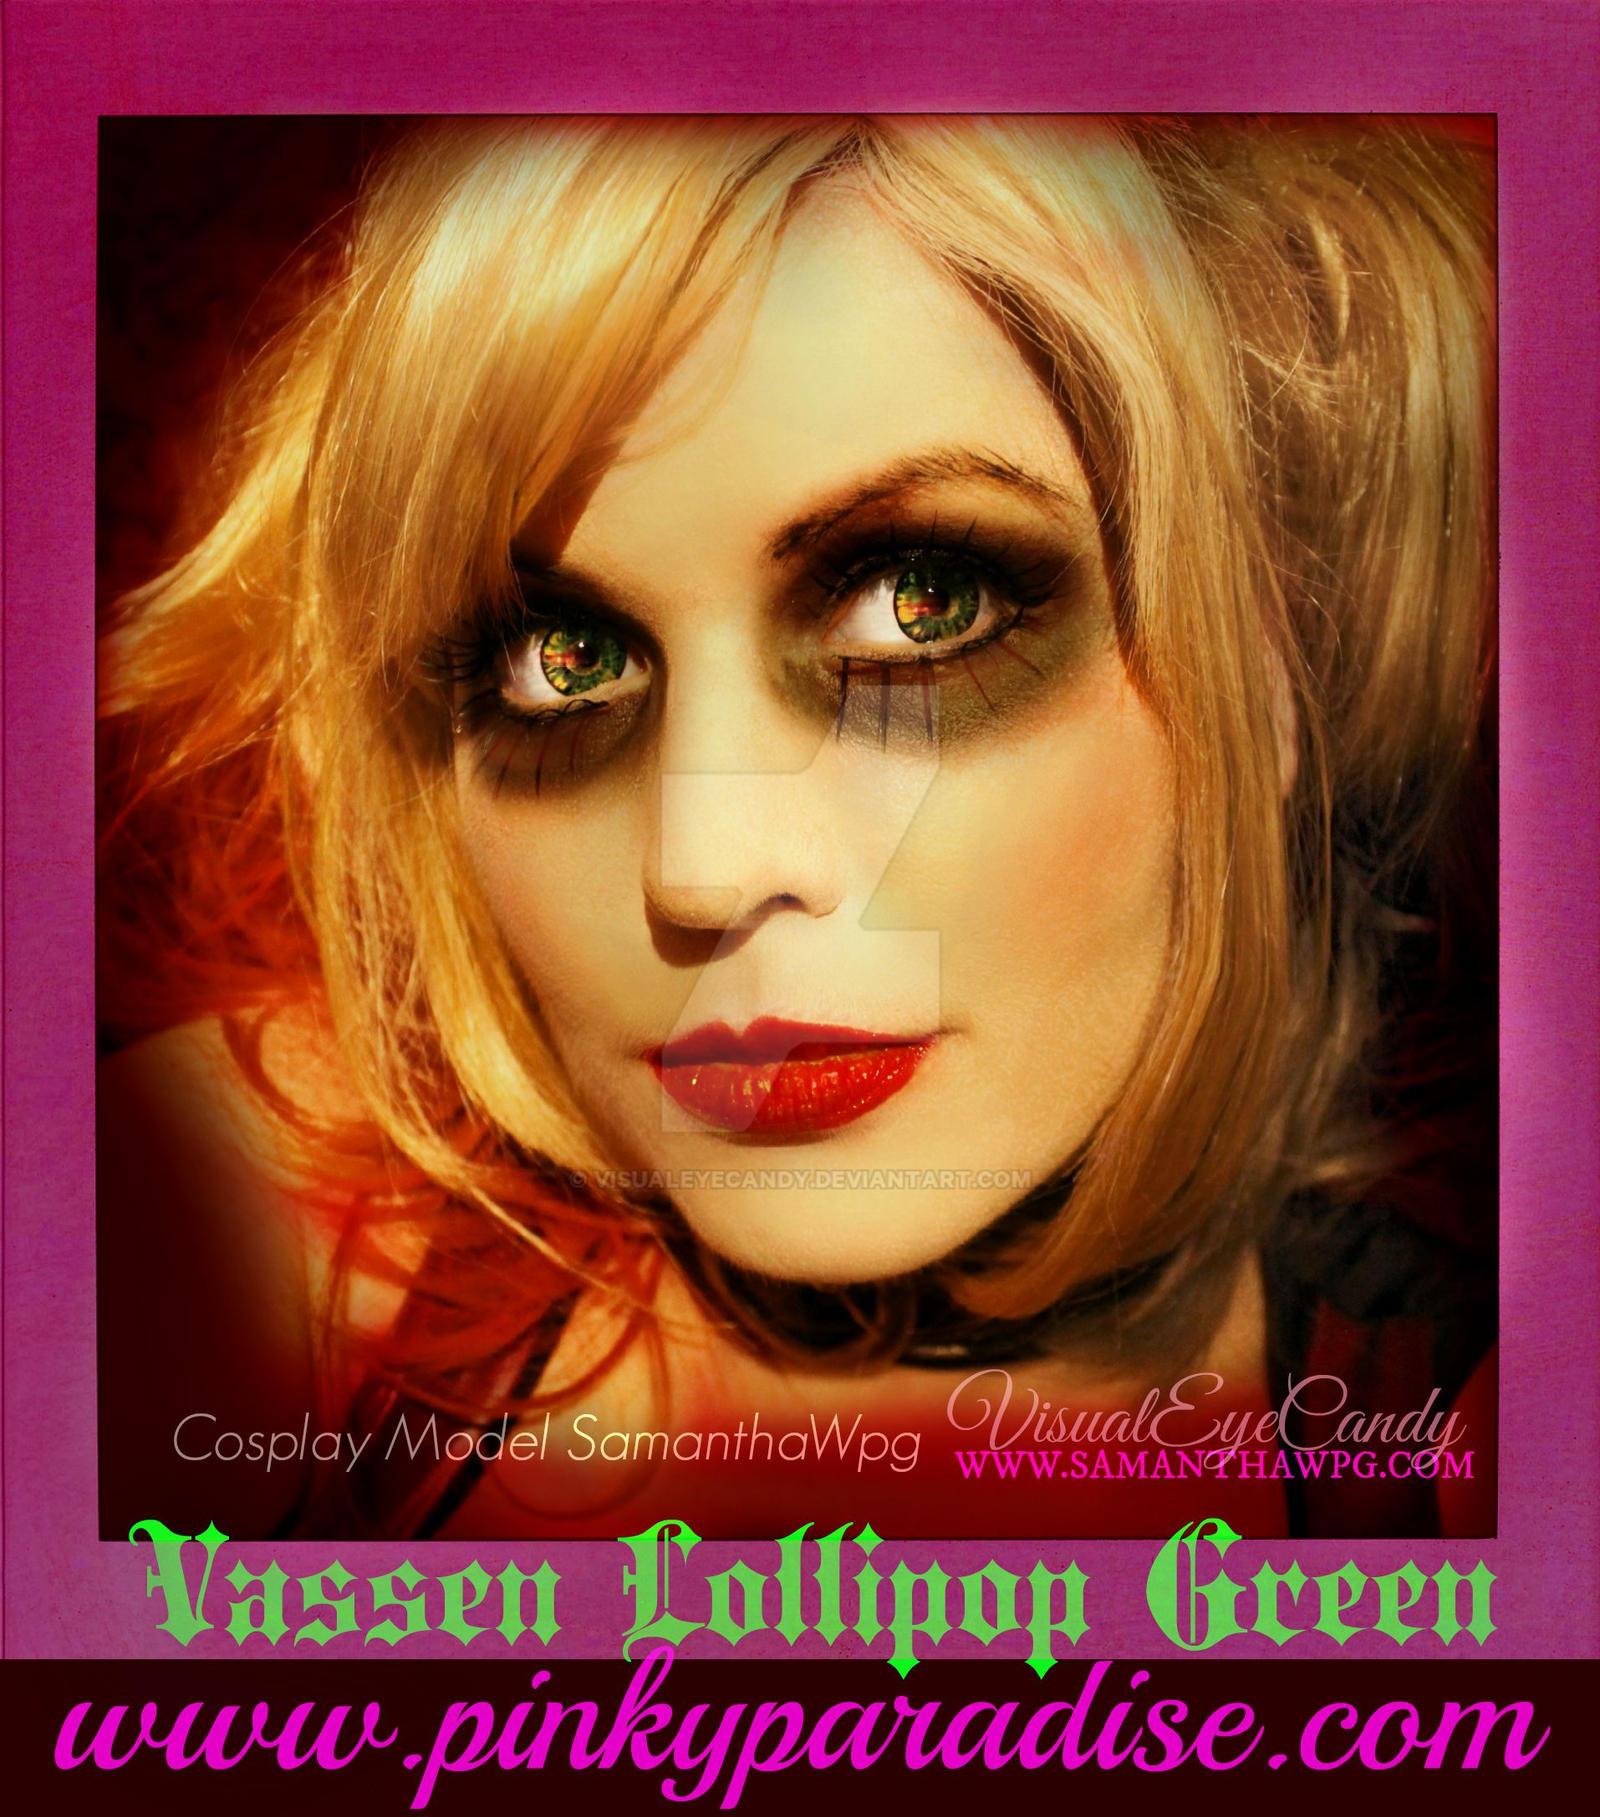 SamanthaWpg Arkham HarleyQuinn Cosplay by VisualEyeCandy